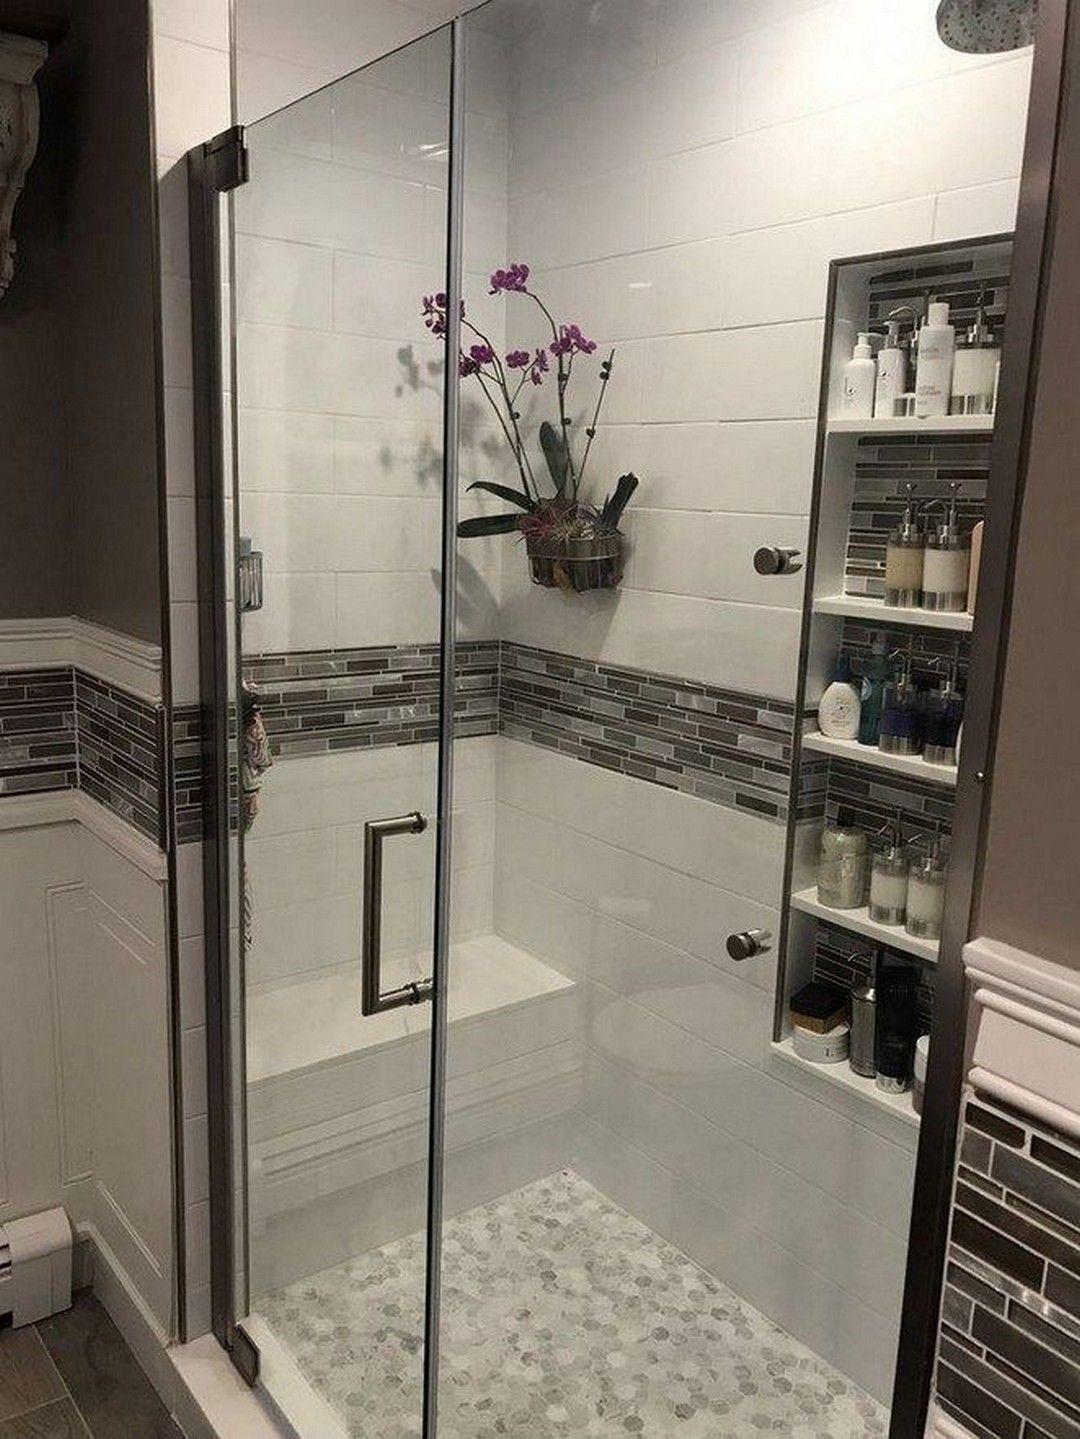 25+ Guest bathroom ideas on a budget information